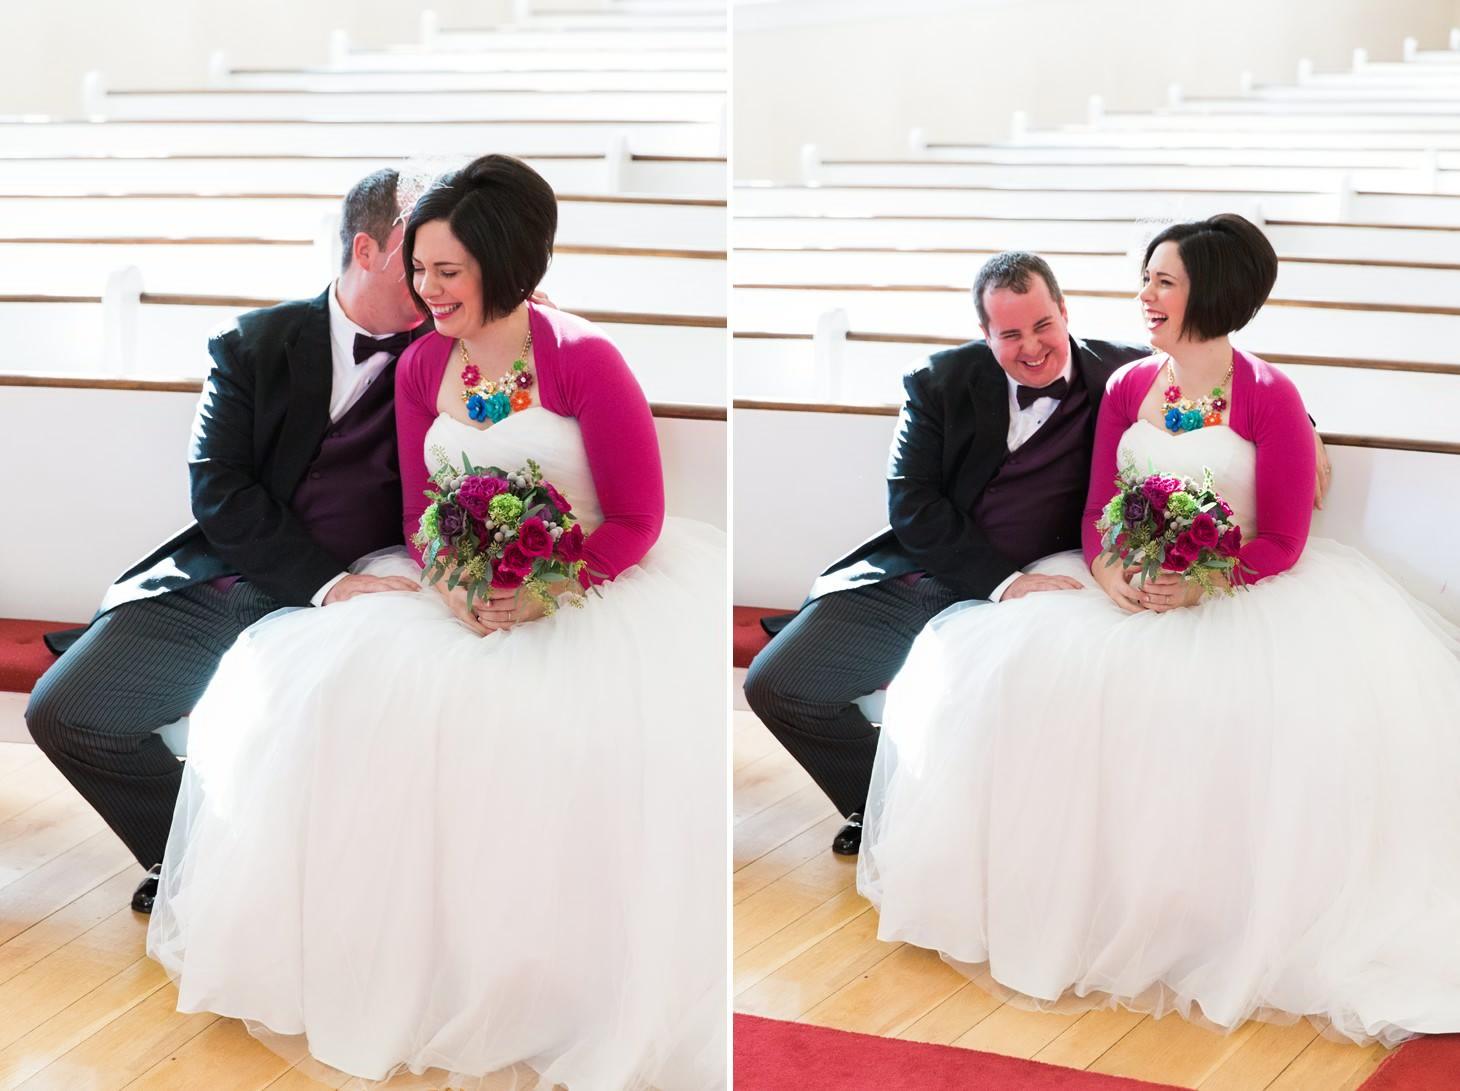 027-nyc-wedding-photographer-smitten-chickens-nj-montclair-art-museum.jpg